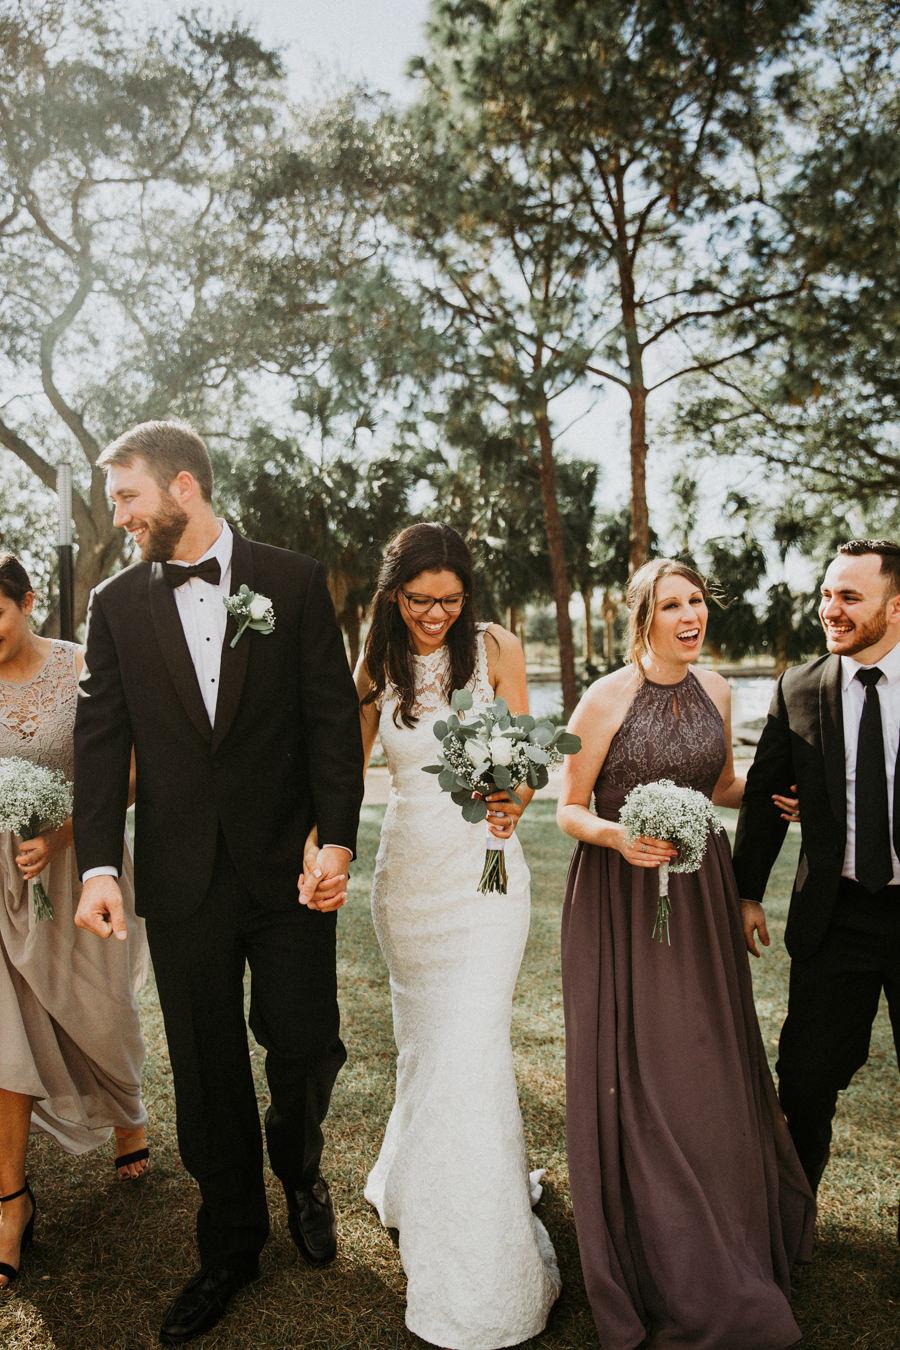 Tampa Heights Industrial Wedding at Cavu Emmy RJ-96.jpg